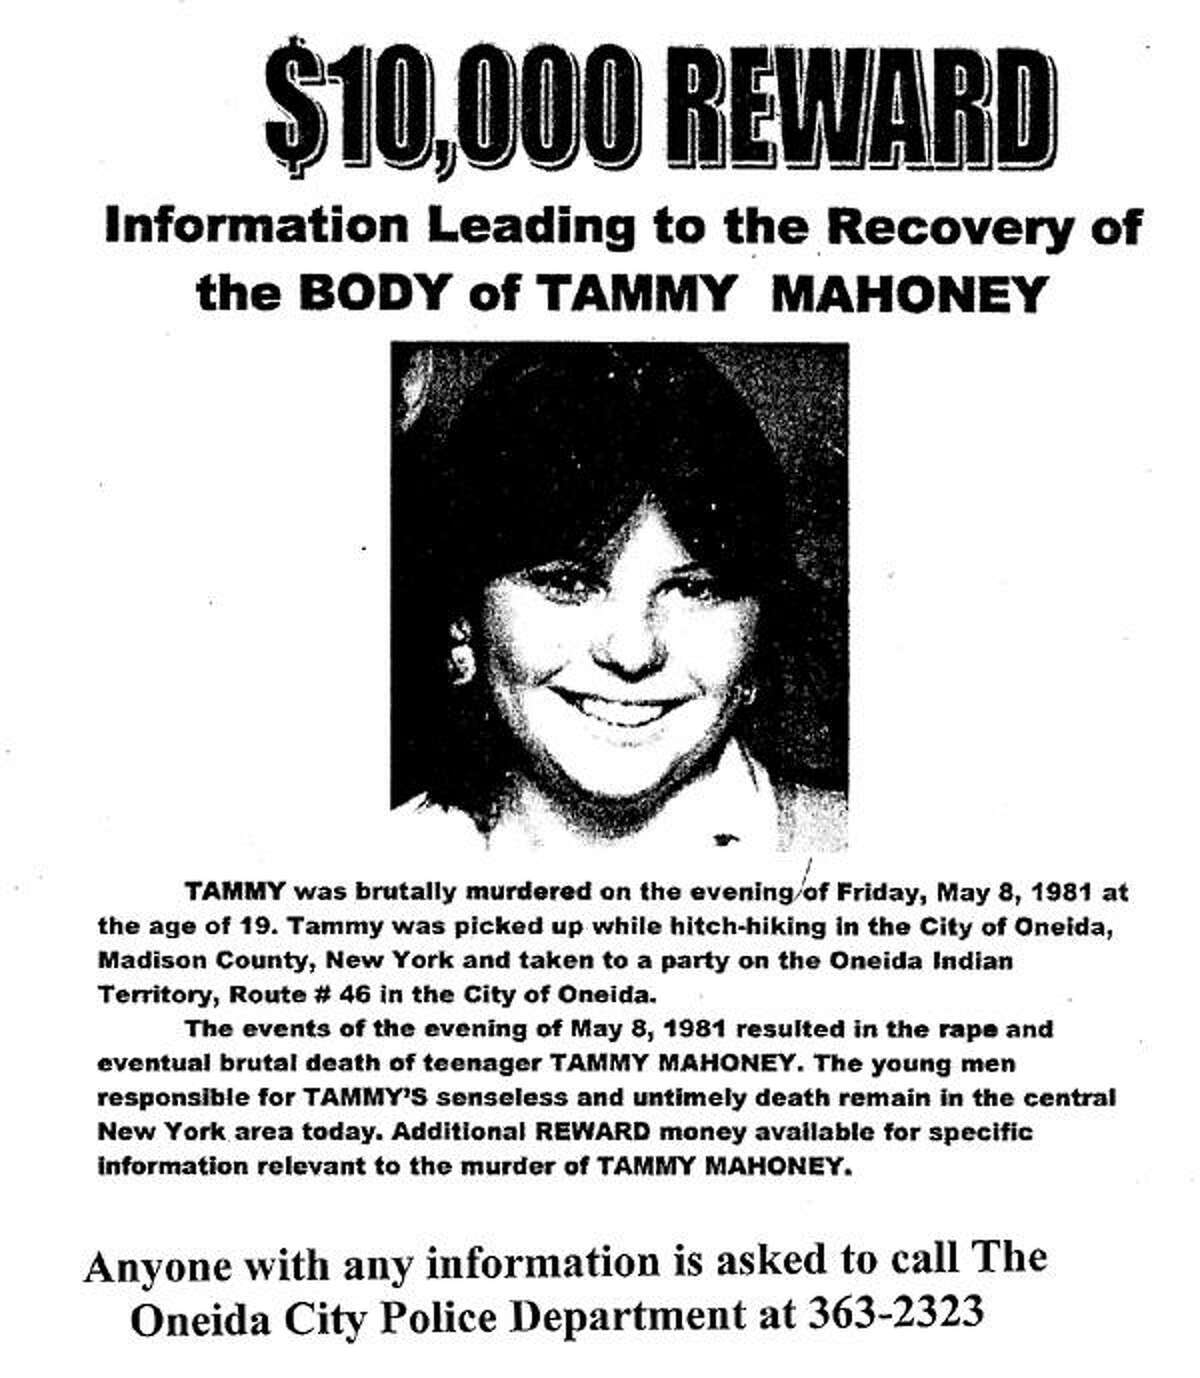 Tammy Mahoney